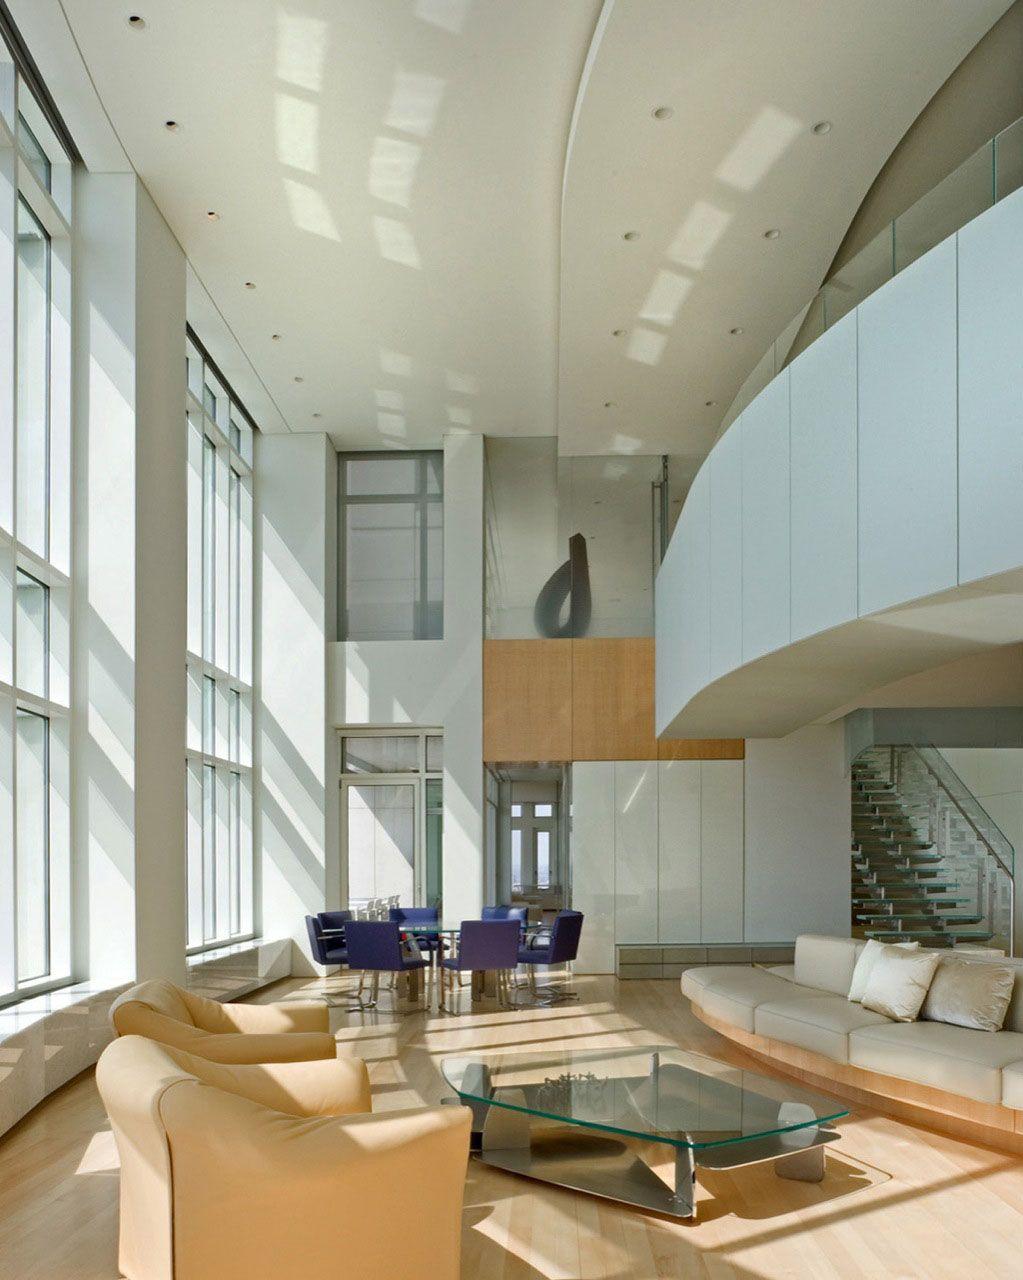 Cloud II Penthouse Apartment In Milwaukee Wisconsin ApartmentDream ApartmentDesign ArchitectHome Interior